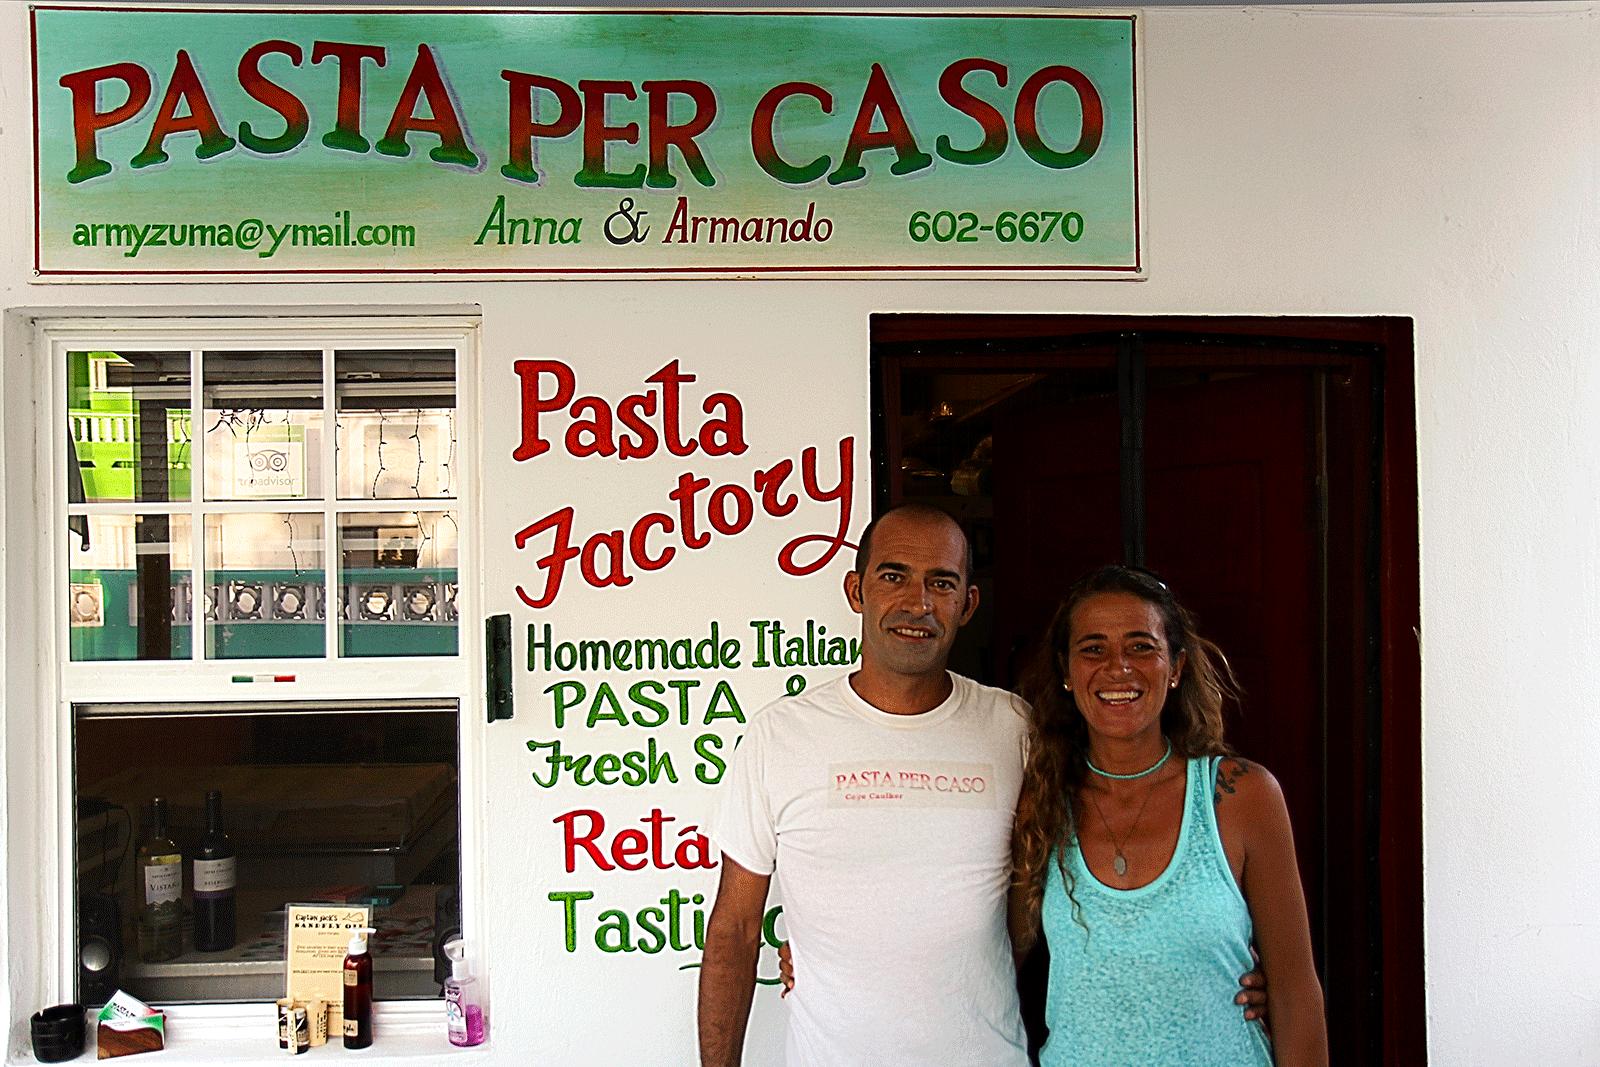 Italian Restaurant Pasta Per Caso Caye Caulker Belize